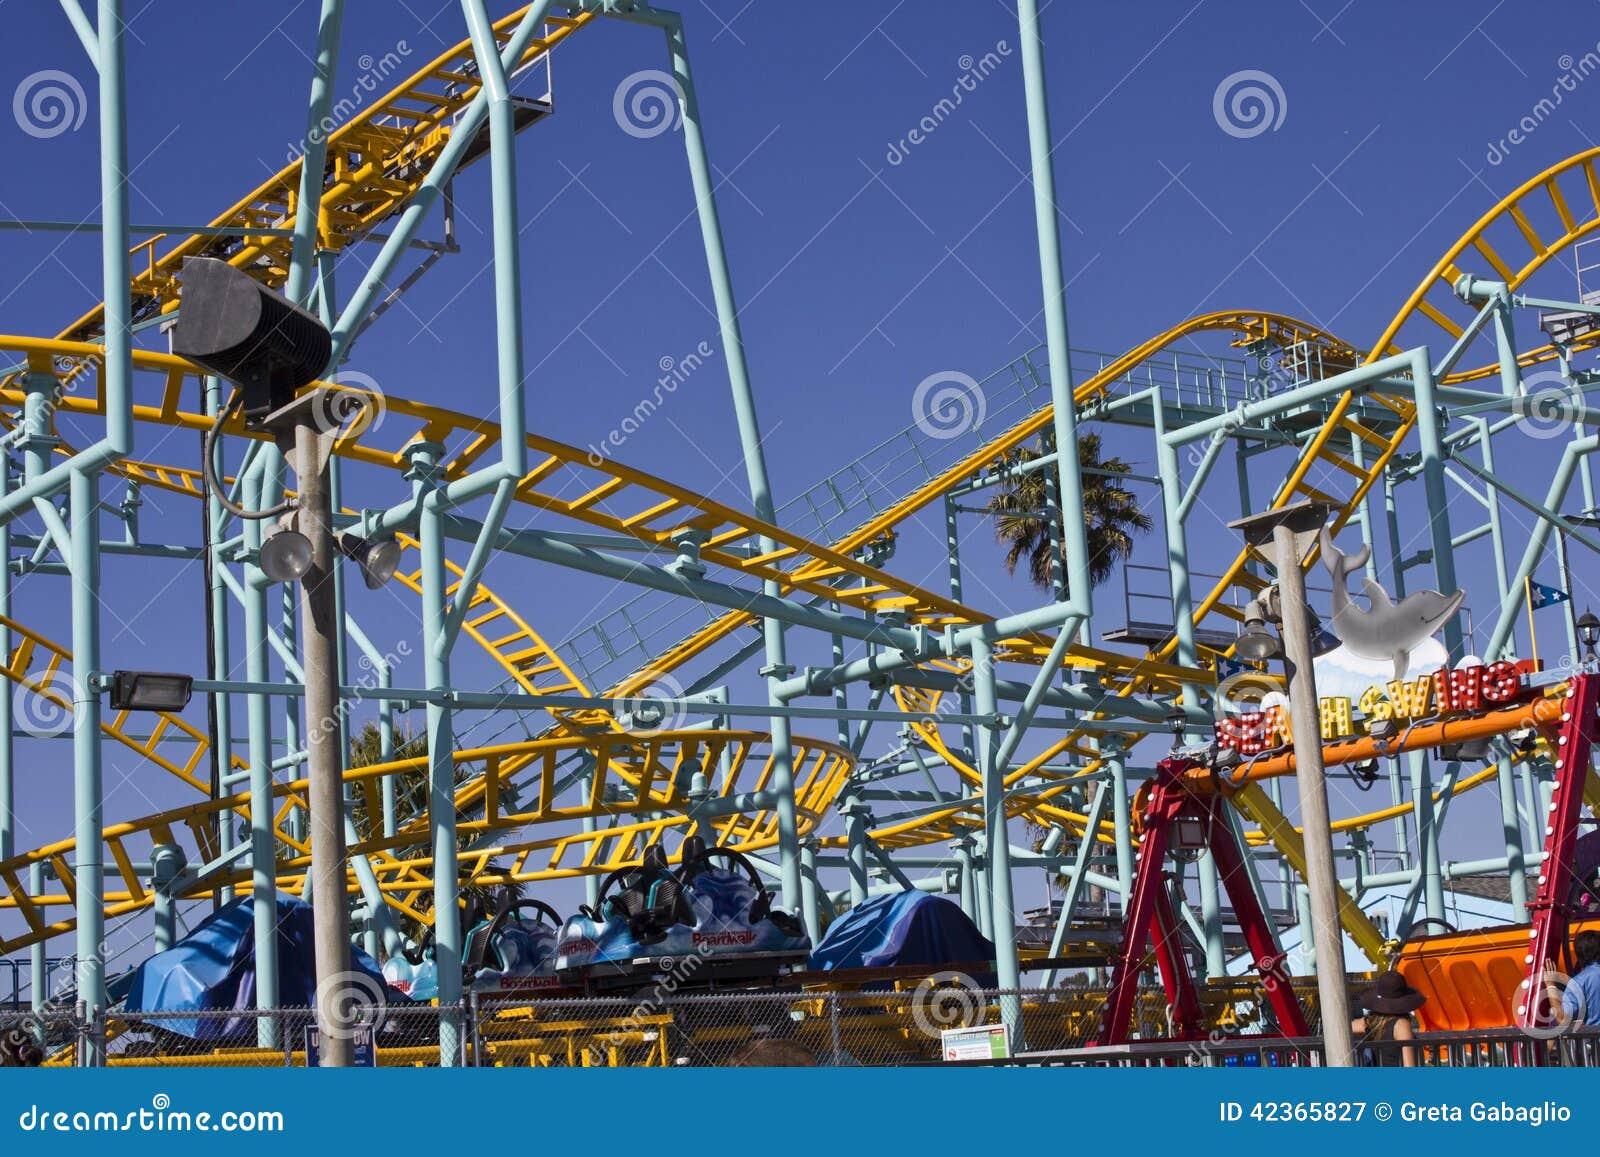 Th the largest city in california - Santa Cruz Fun Park Rollercoaster Editorial Photography